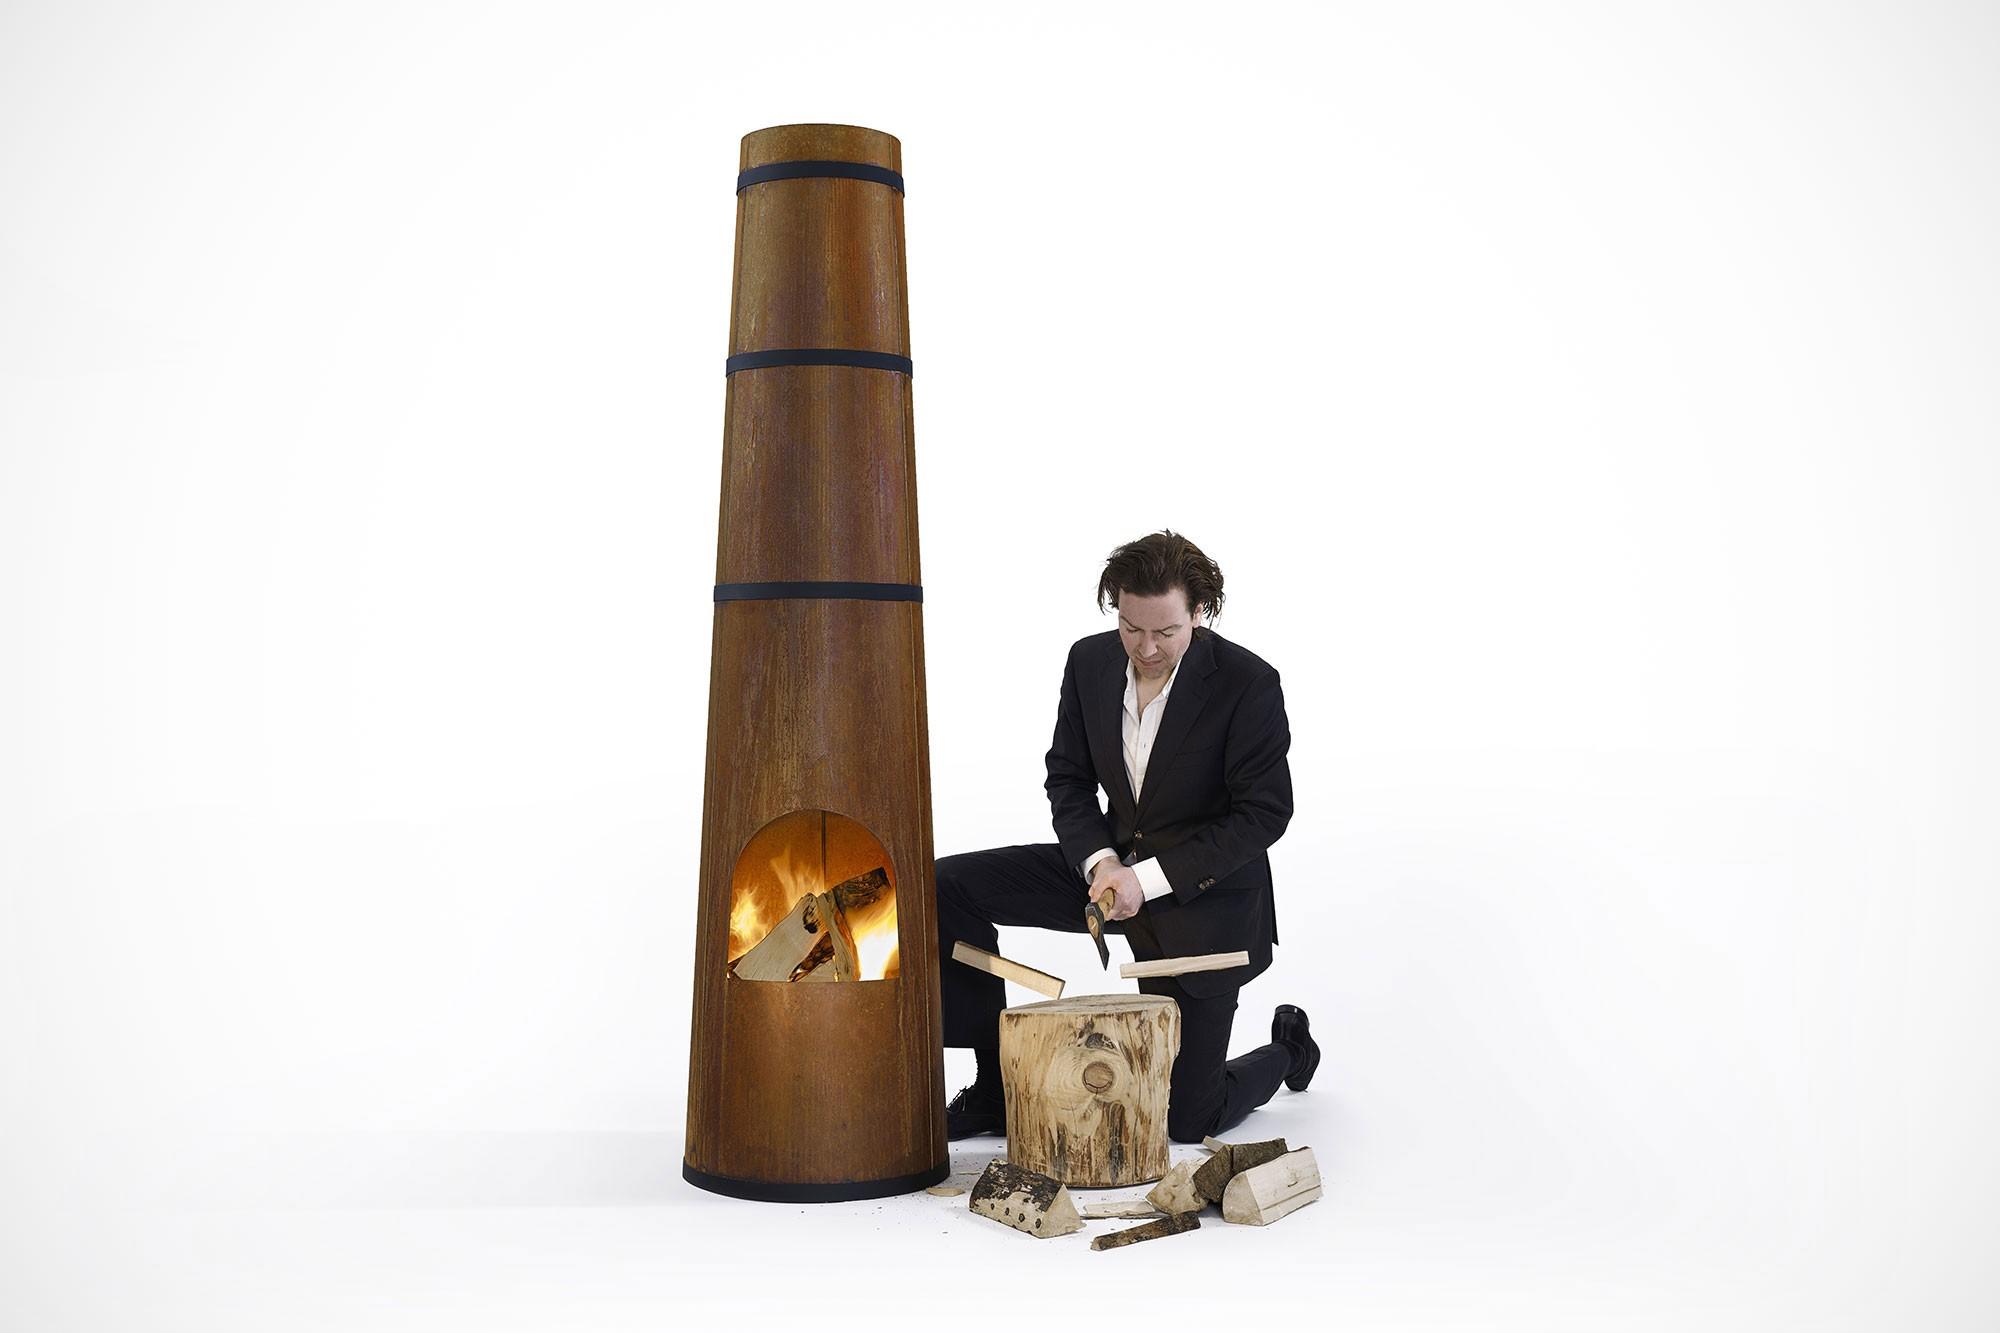 smokestack-cheminee-exterieur-barbecue